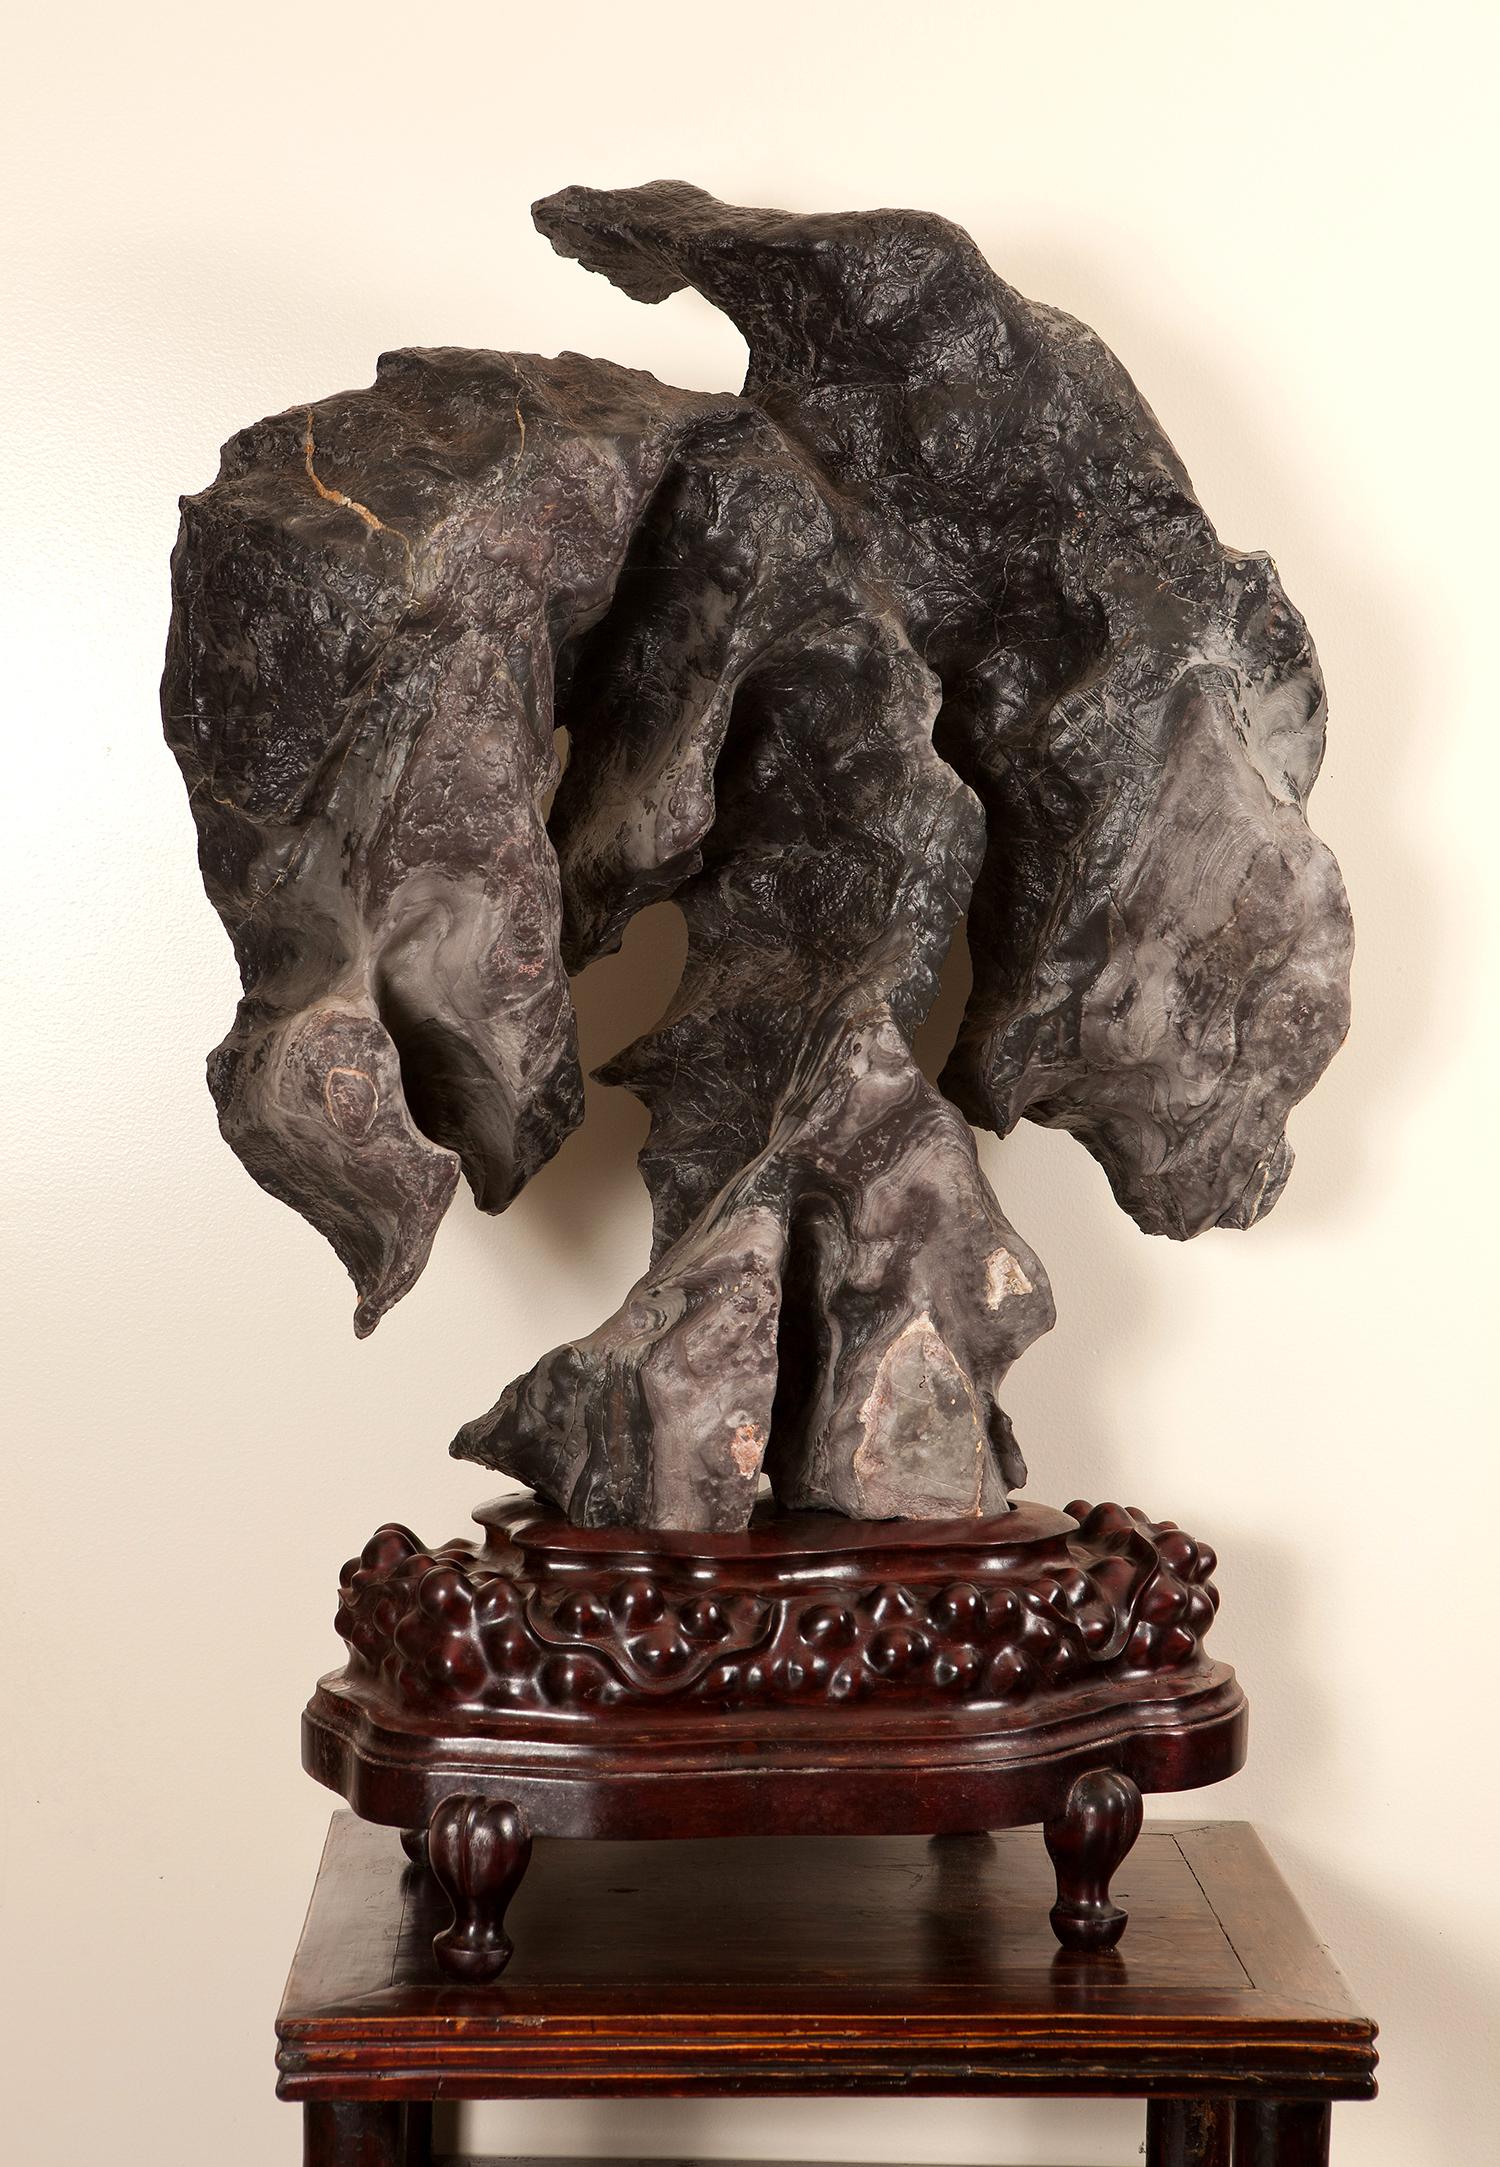 Chinese Scholar's Rock - Lingbi Stone